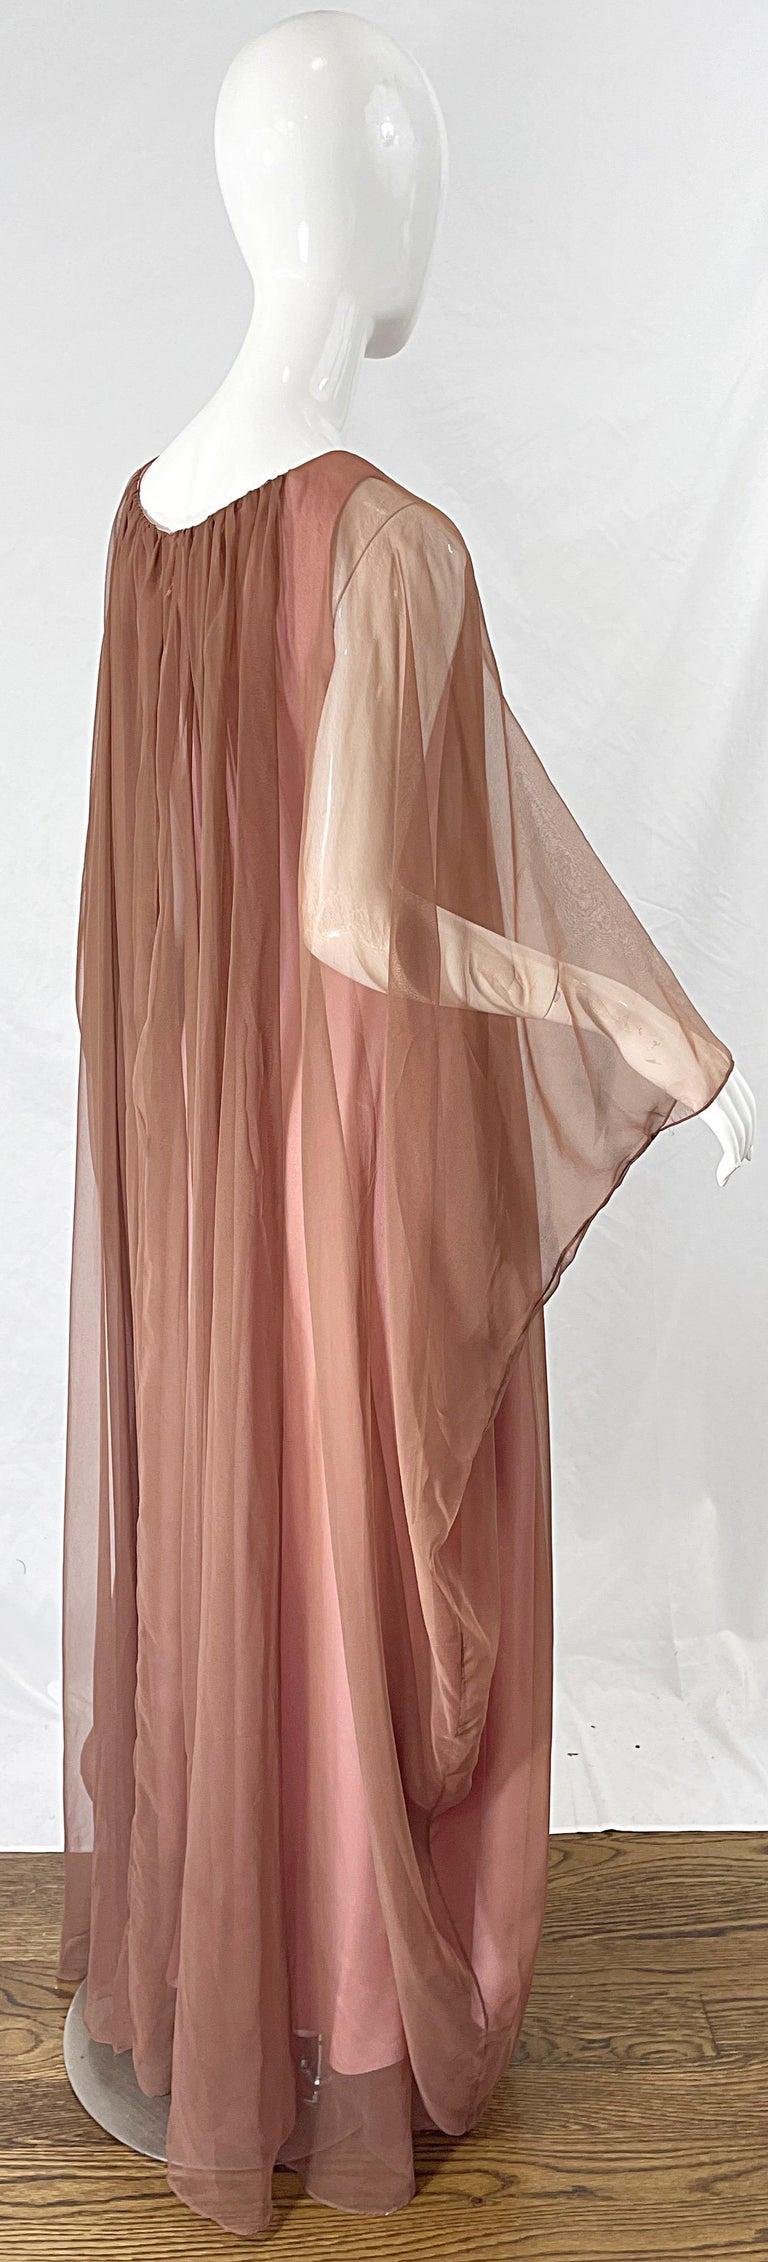 Women's 1970s Estevez Pink + Nude Brown Chiffon Caftan Vintage 70s Kaftan Maxi Dress For Sale